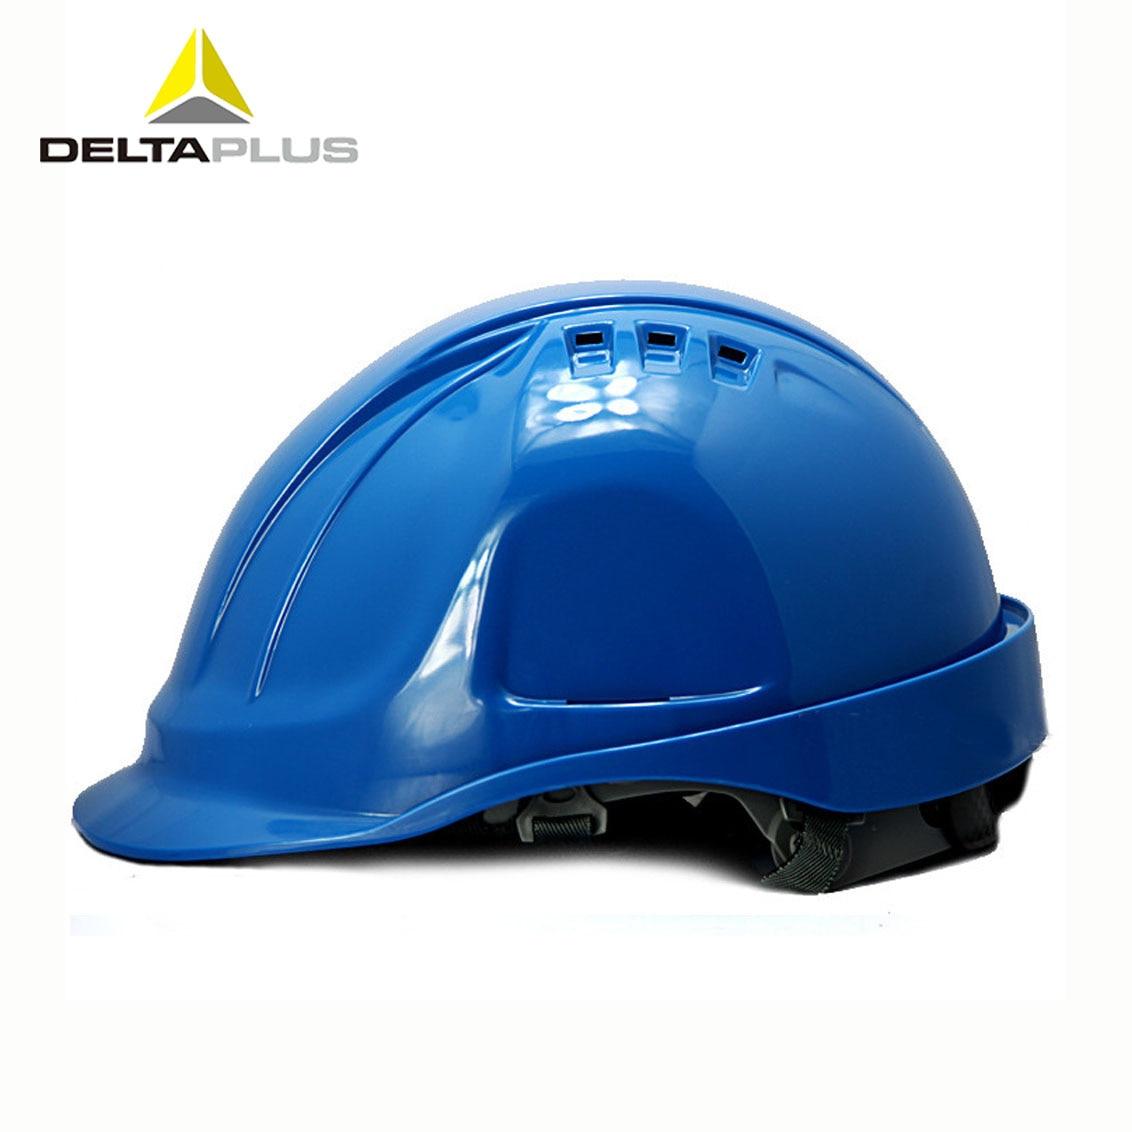 Sicherheit & Schutz Arbeitsplatz Sicherheit Liefert Kreativ Schutzhelm Schutzhelm Arbeit Kappe Abs Material Bau Schützen Helme Hohe Qualität Atmungsaktive Engineering Power Arbeit Helm